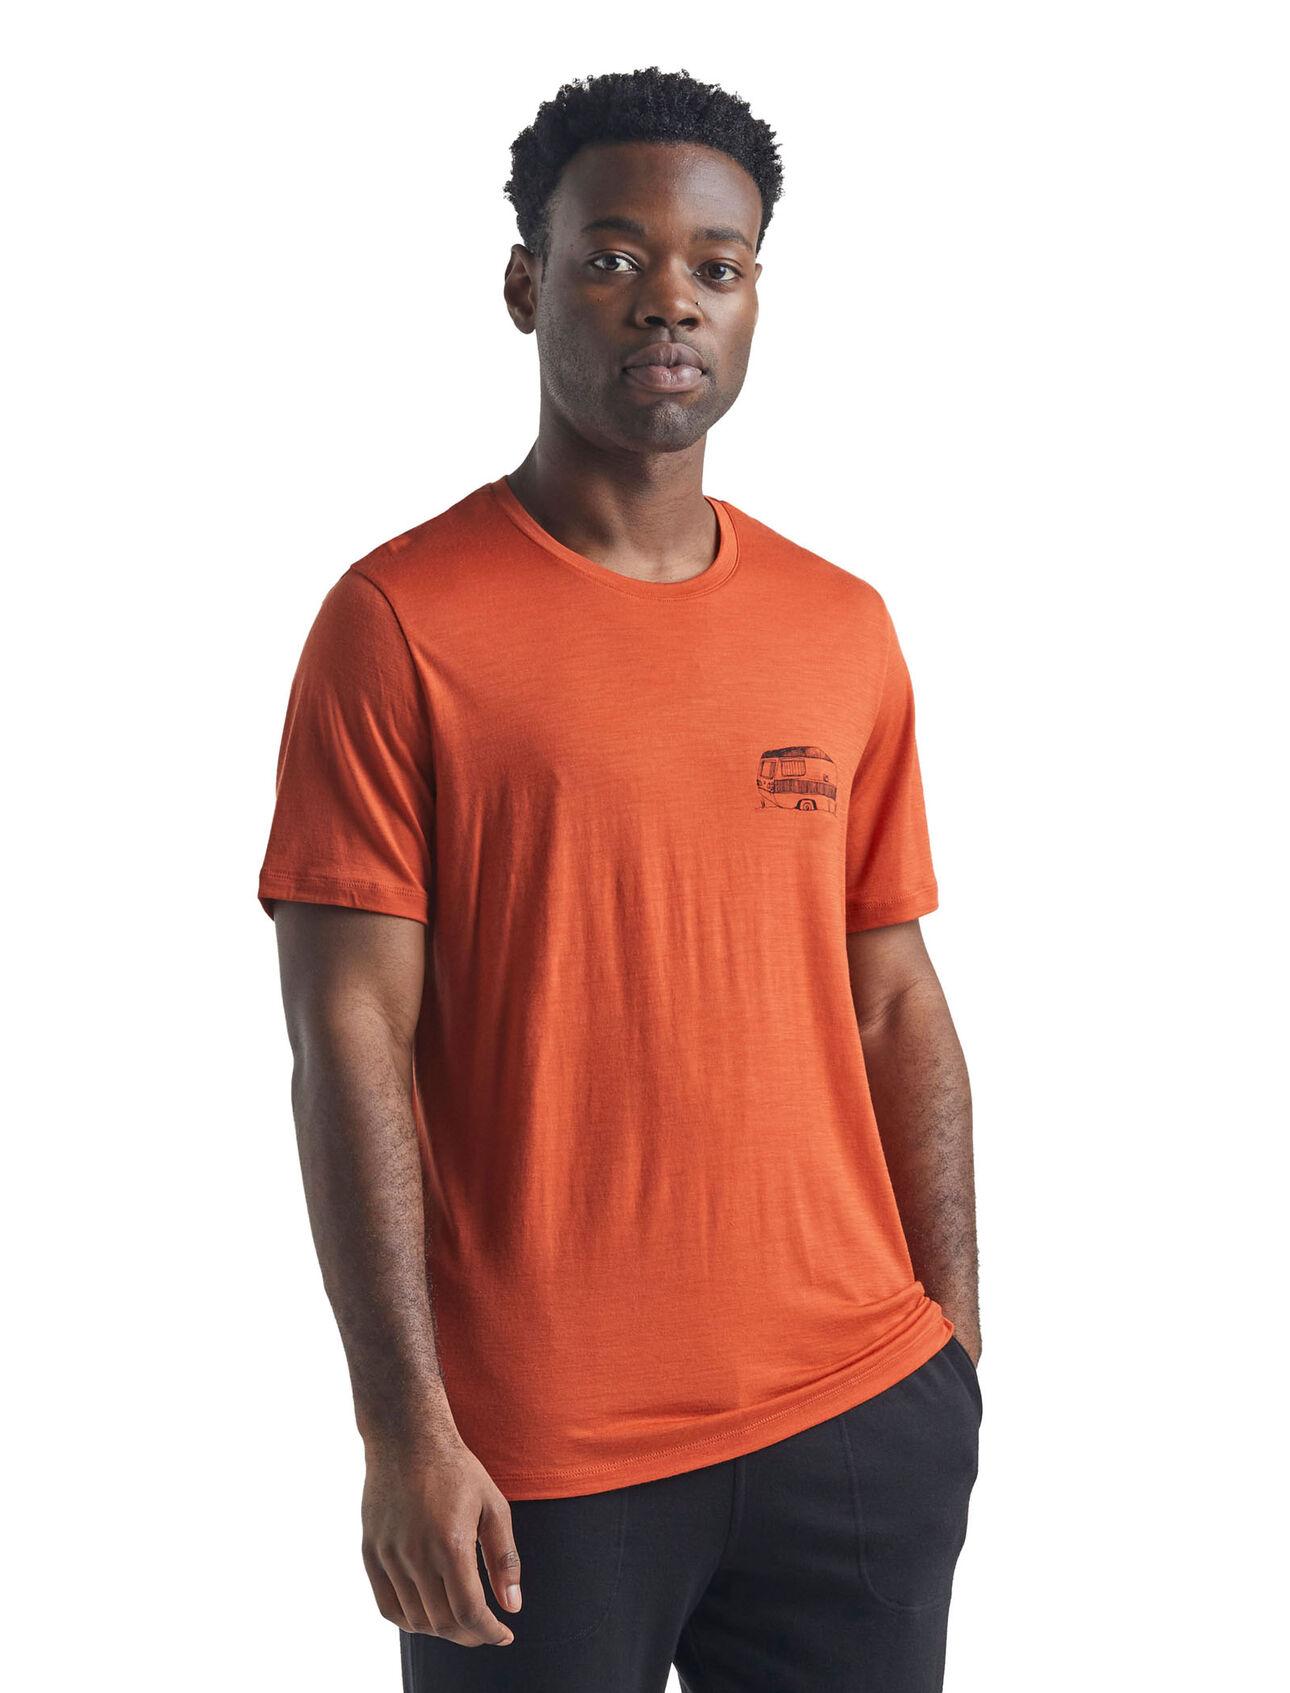 Merino Tech Lite Short Sleeve Crewe T-Shirt Caravan Life